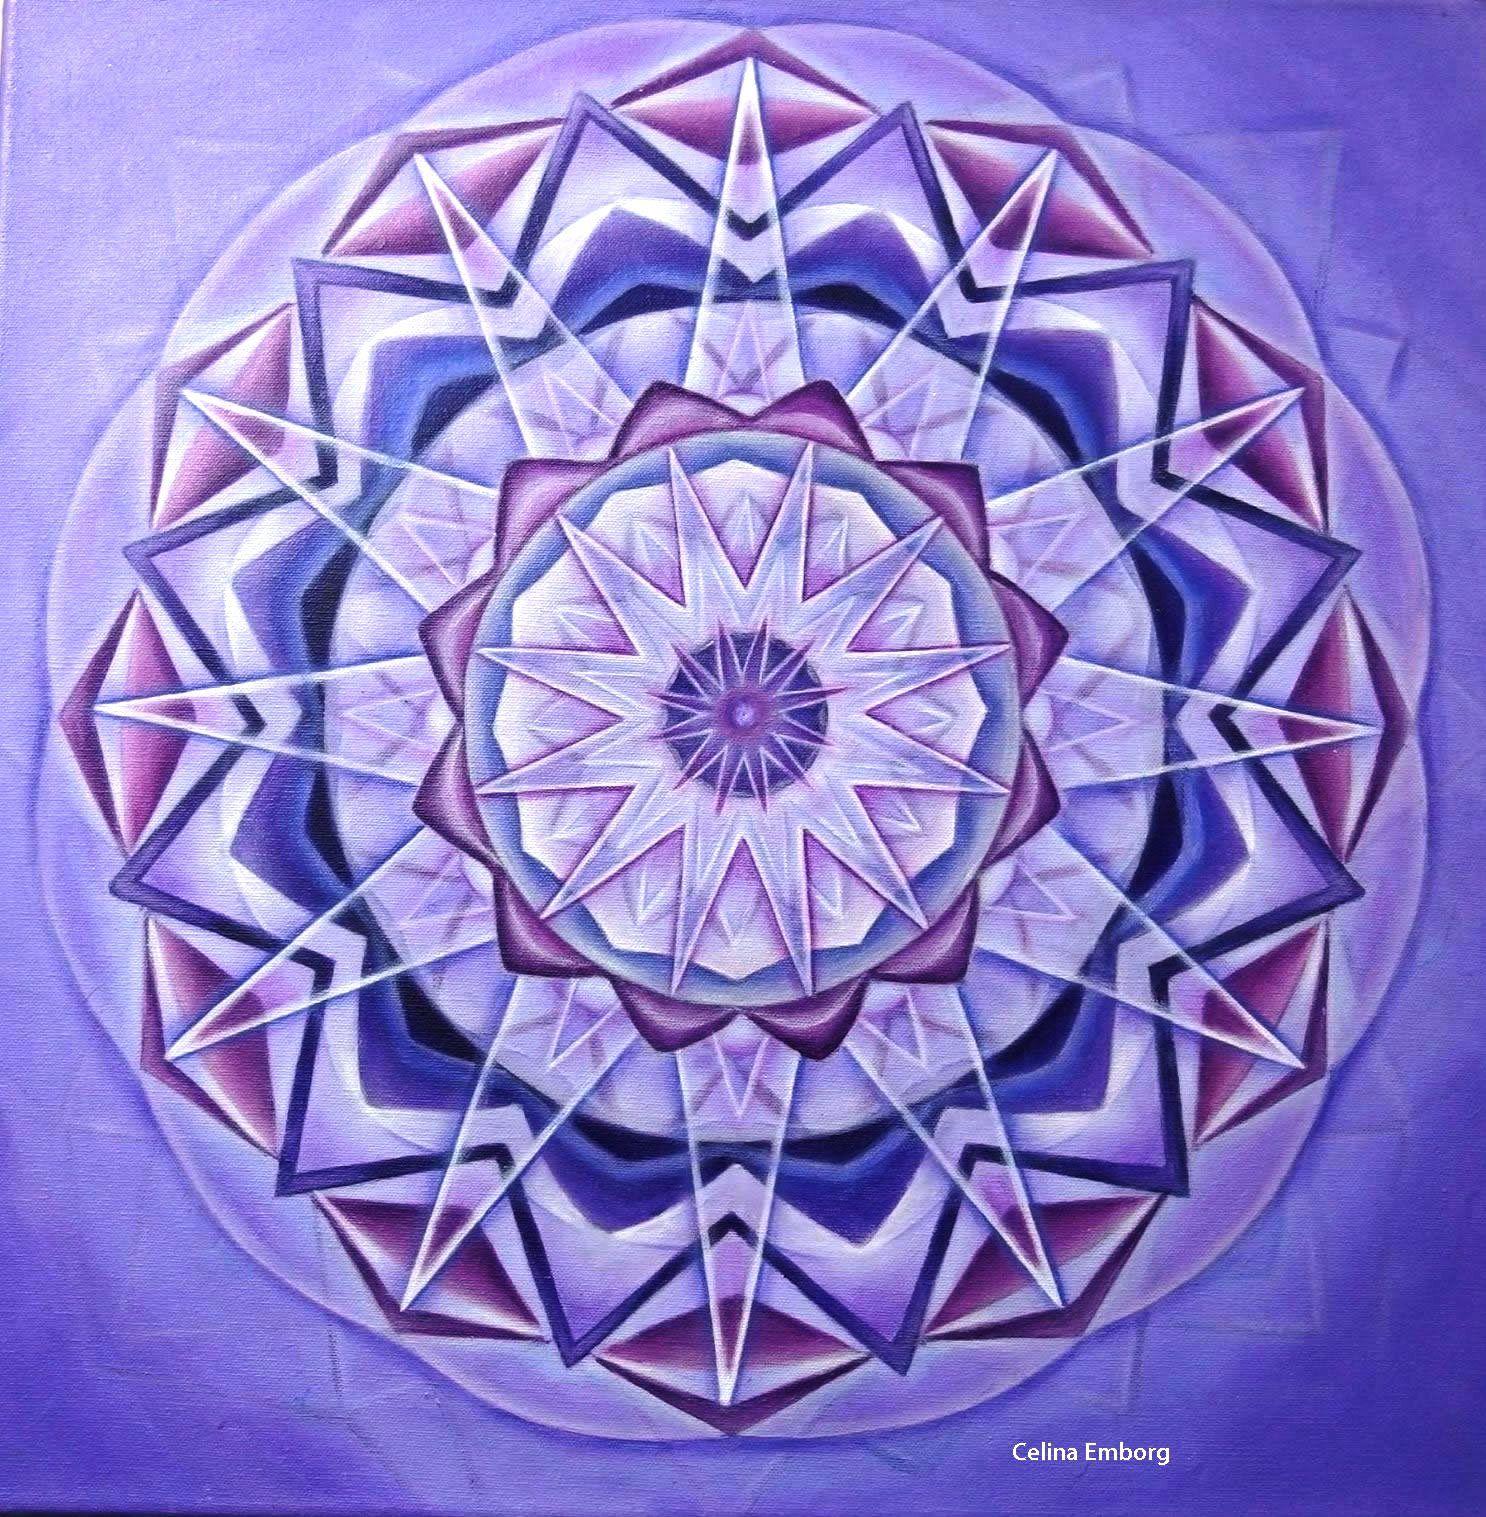 Mandala violeta taller de mandalas curso el significado - Mandalas en colores ...